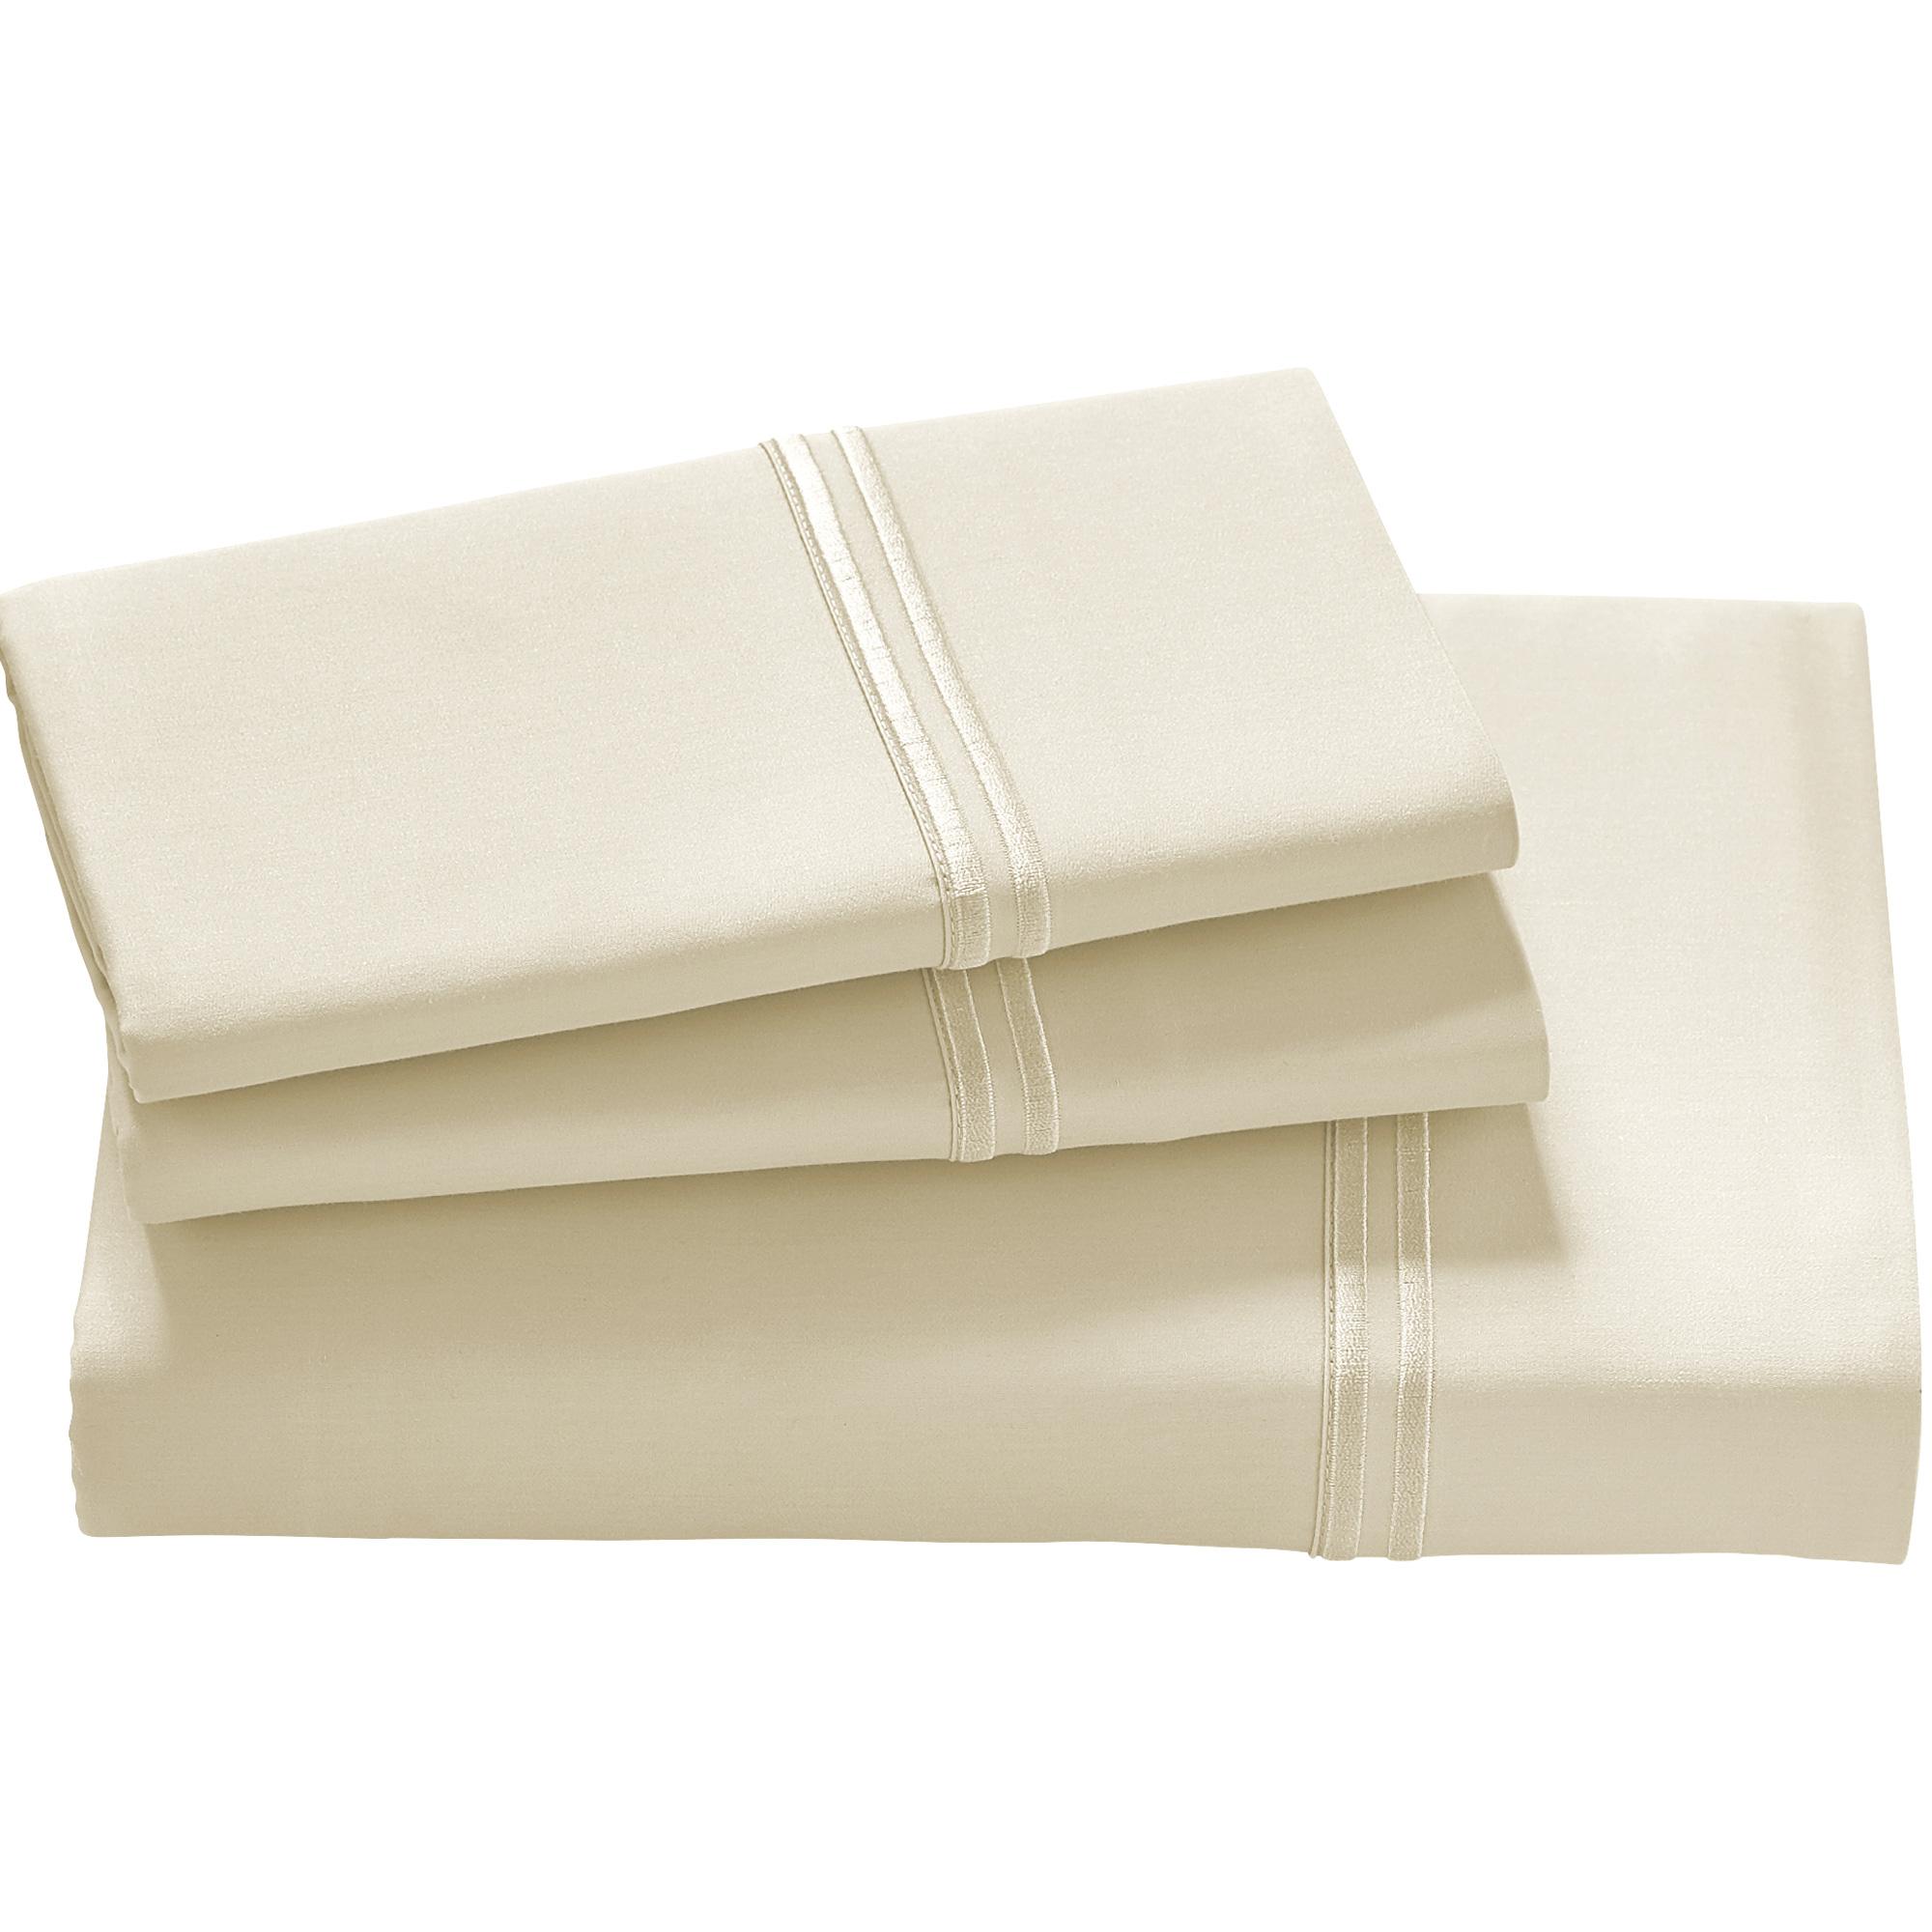 Purecare | Elements Ivory California King Modal Sheet Set